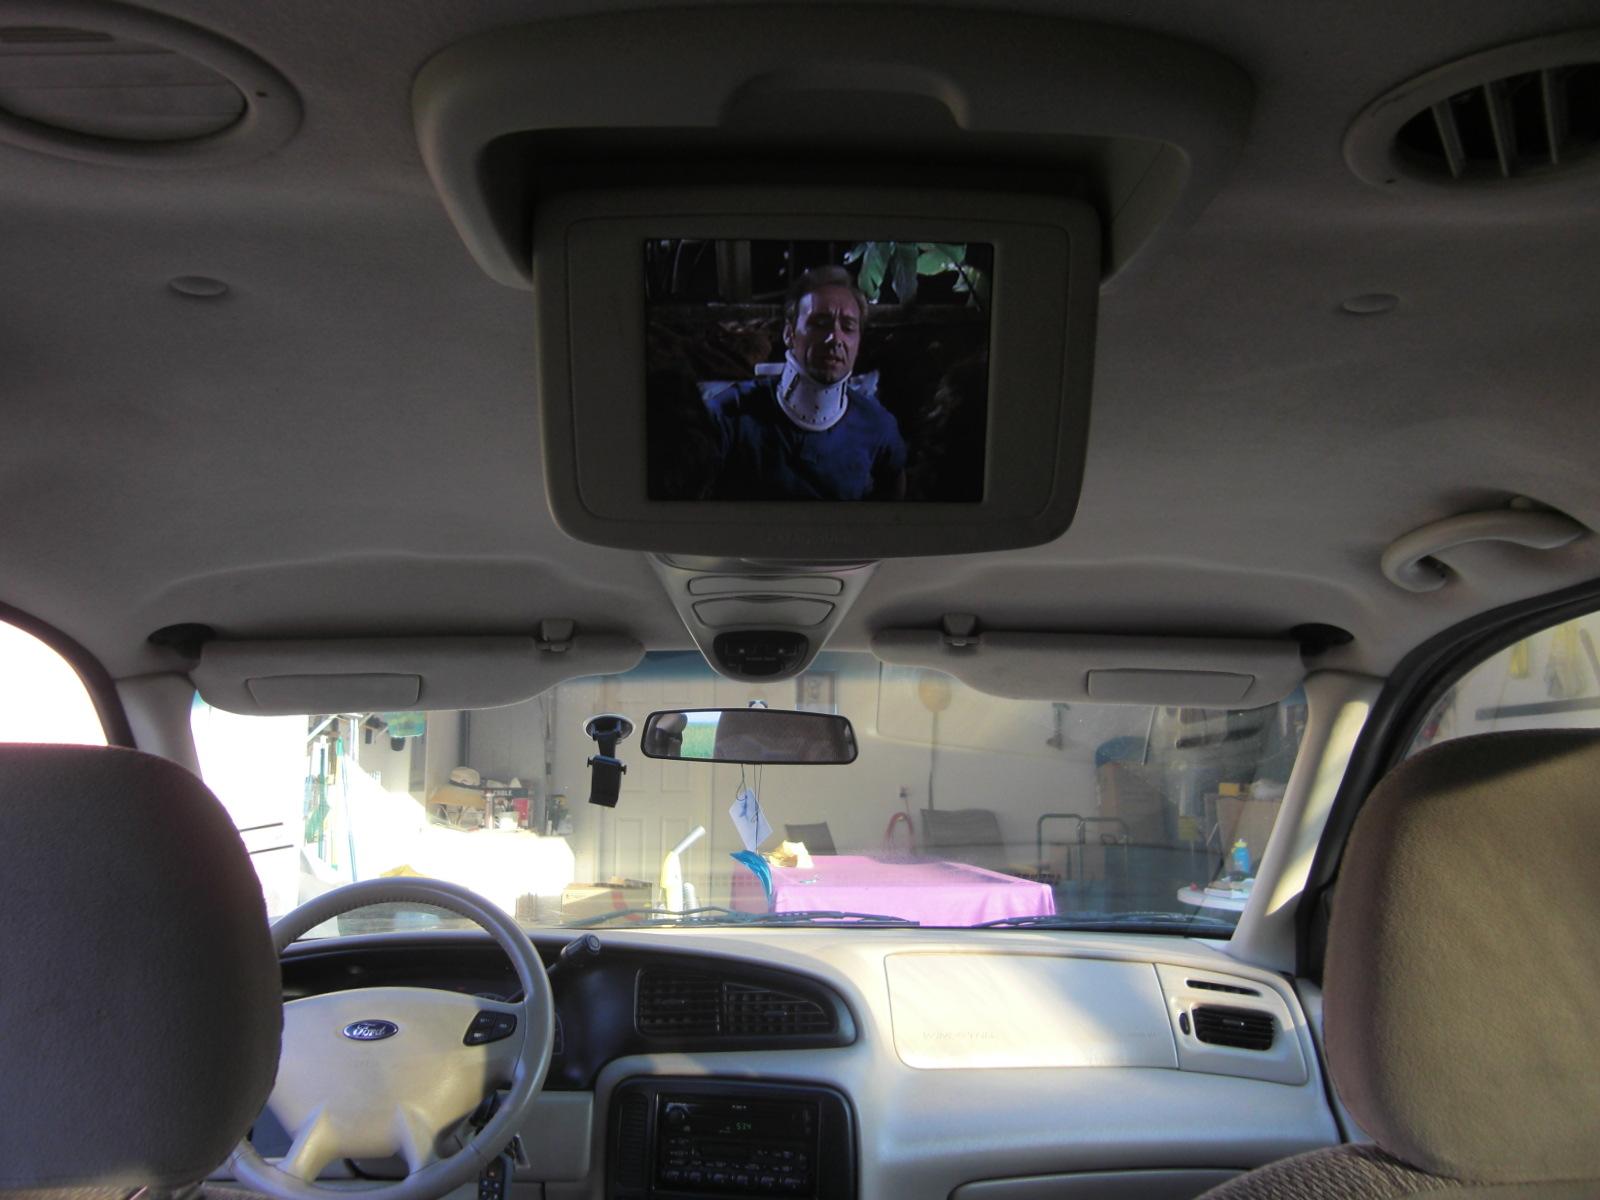 Ford Windstar Sepicture 12 Reviews News Specs Buy Car 2003 Sel Se